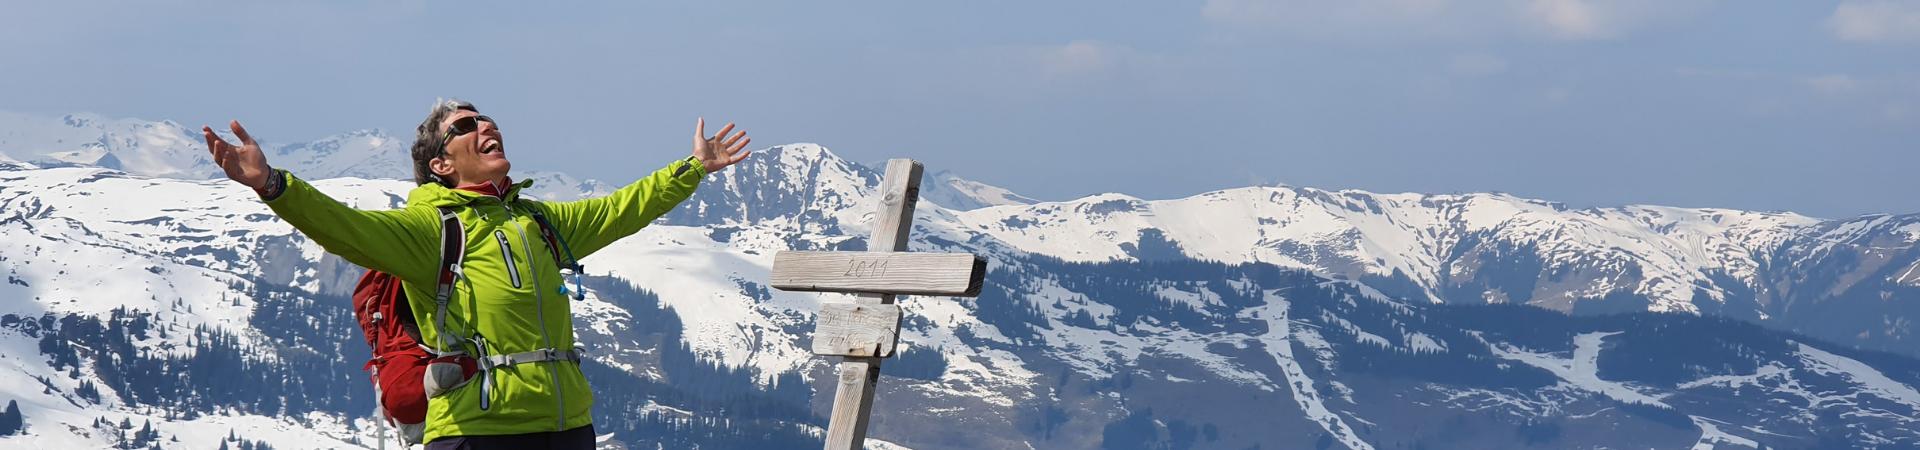 201911366 - Climb Your Mountain LIVE slider